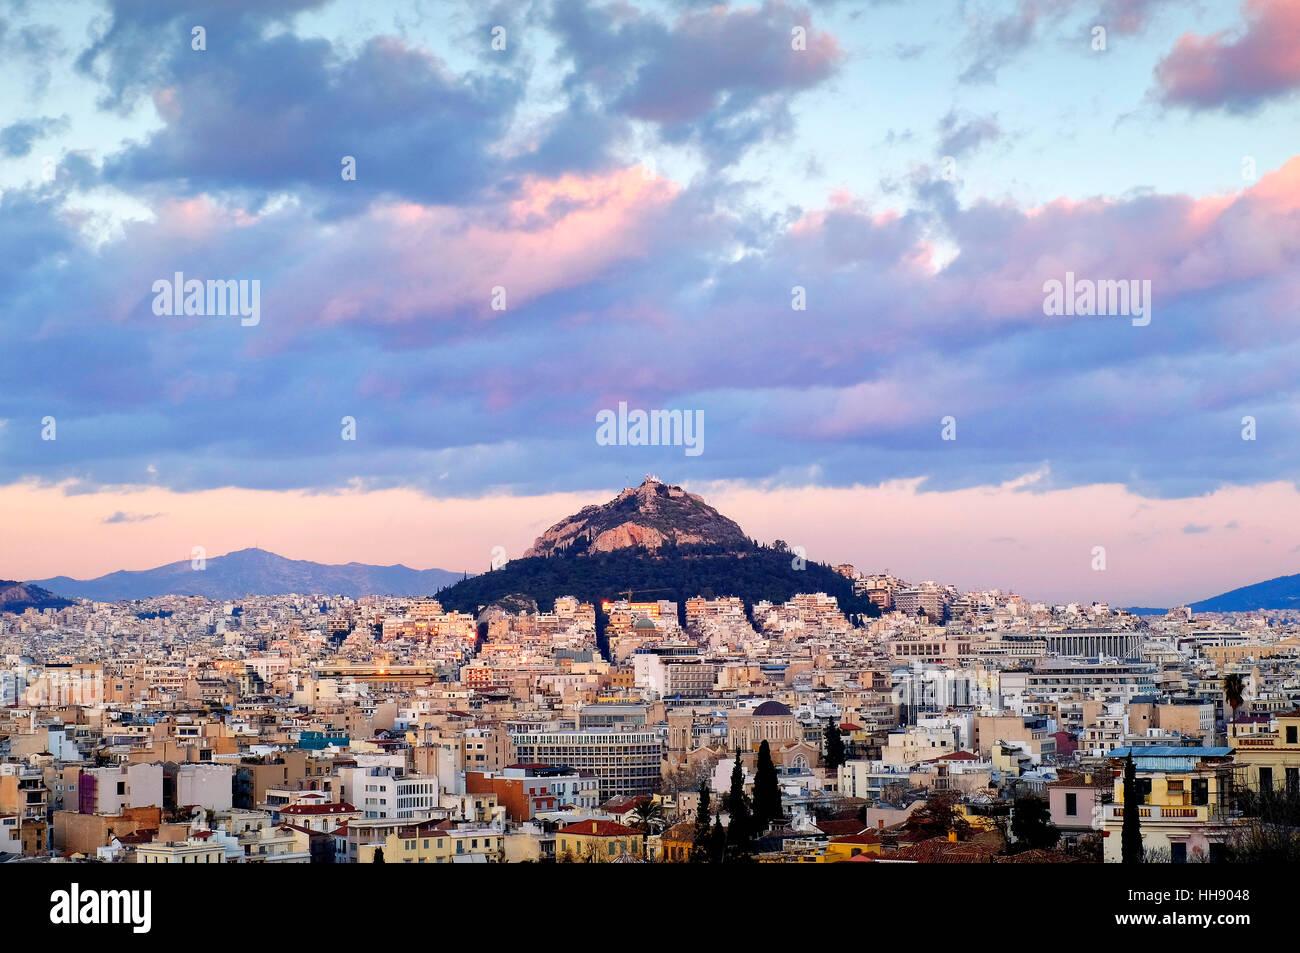 View of Mount Lycabettus, Athens, Greece Stock Photo